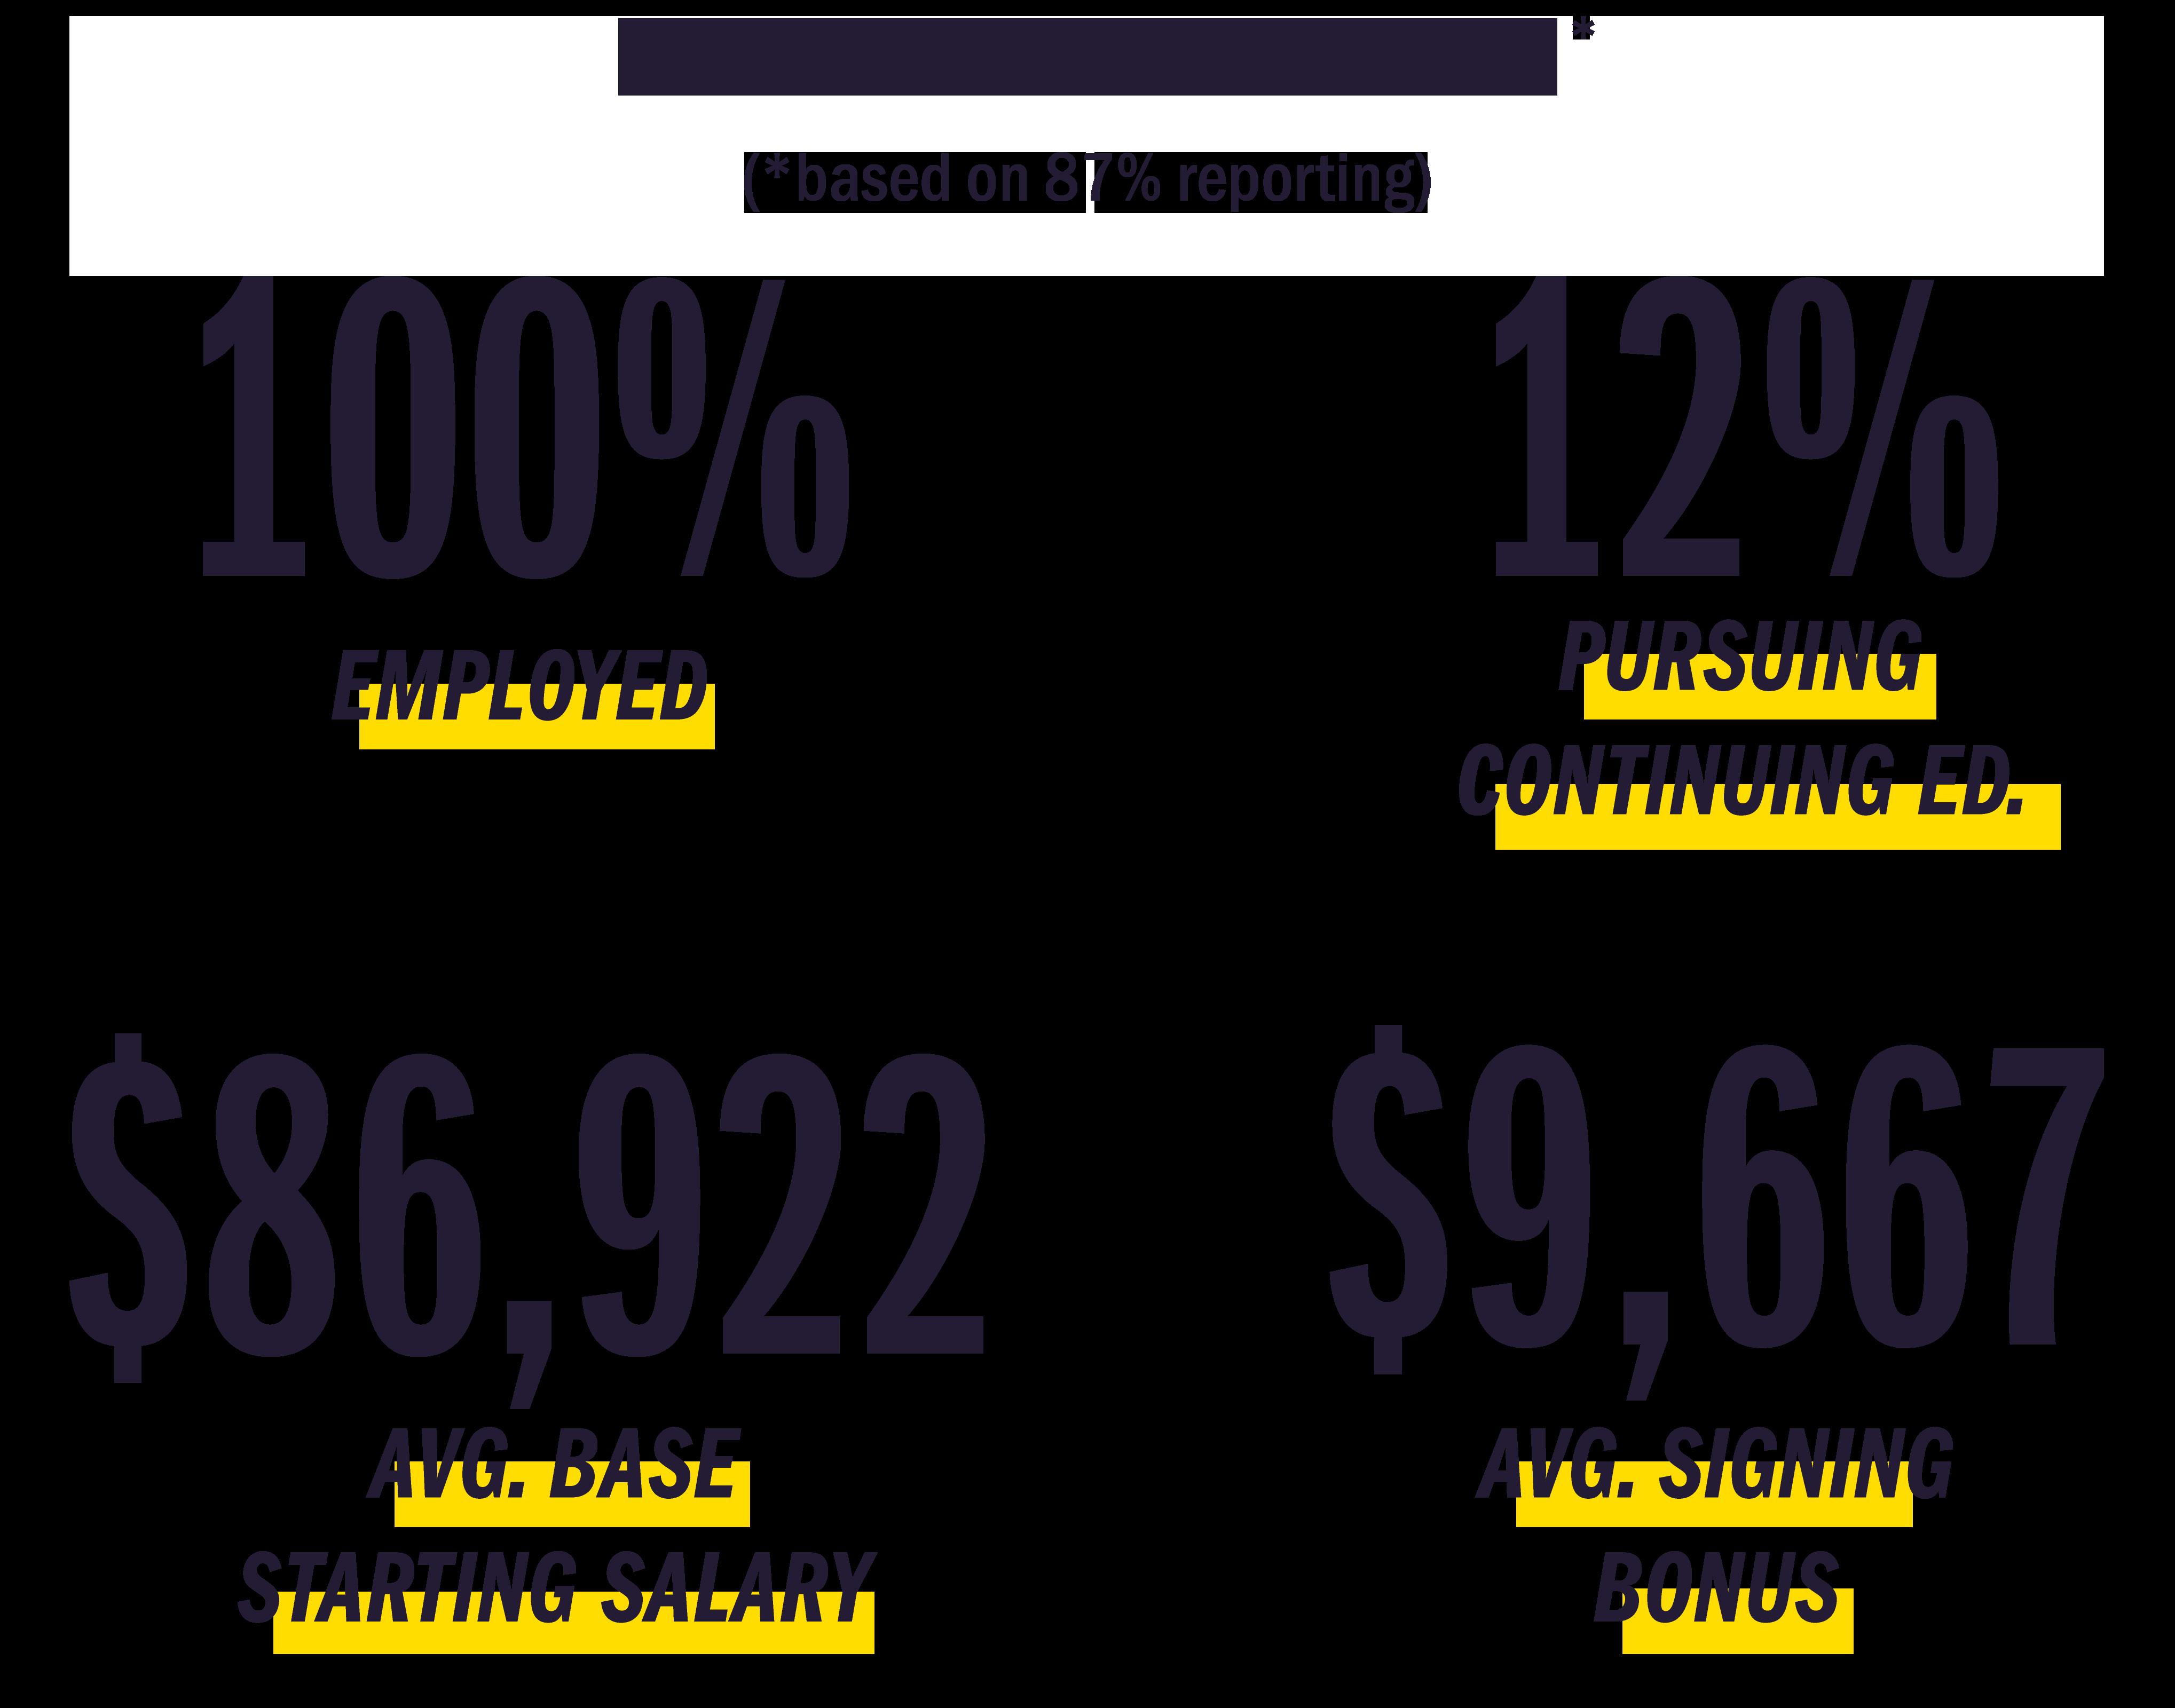 2018 Placement Statistics